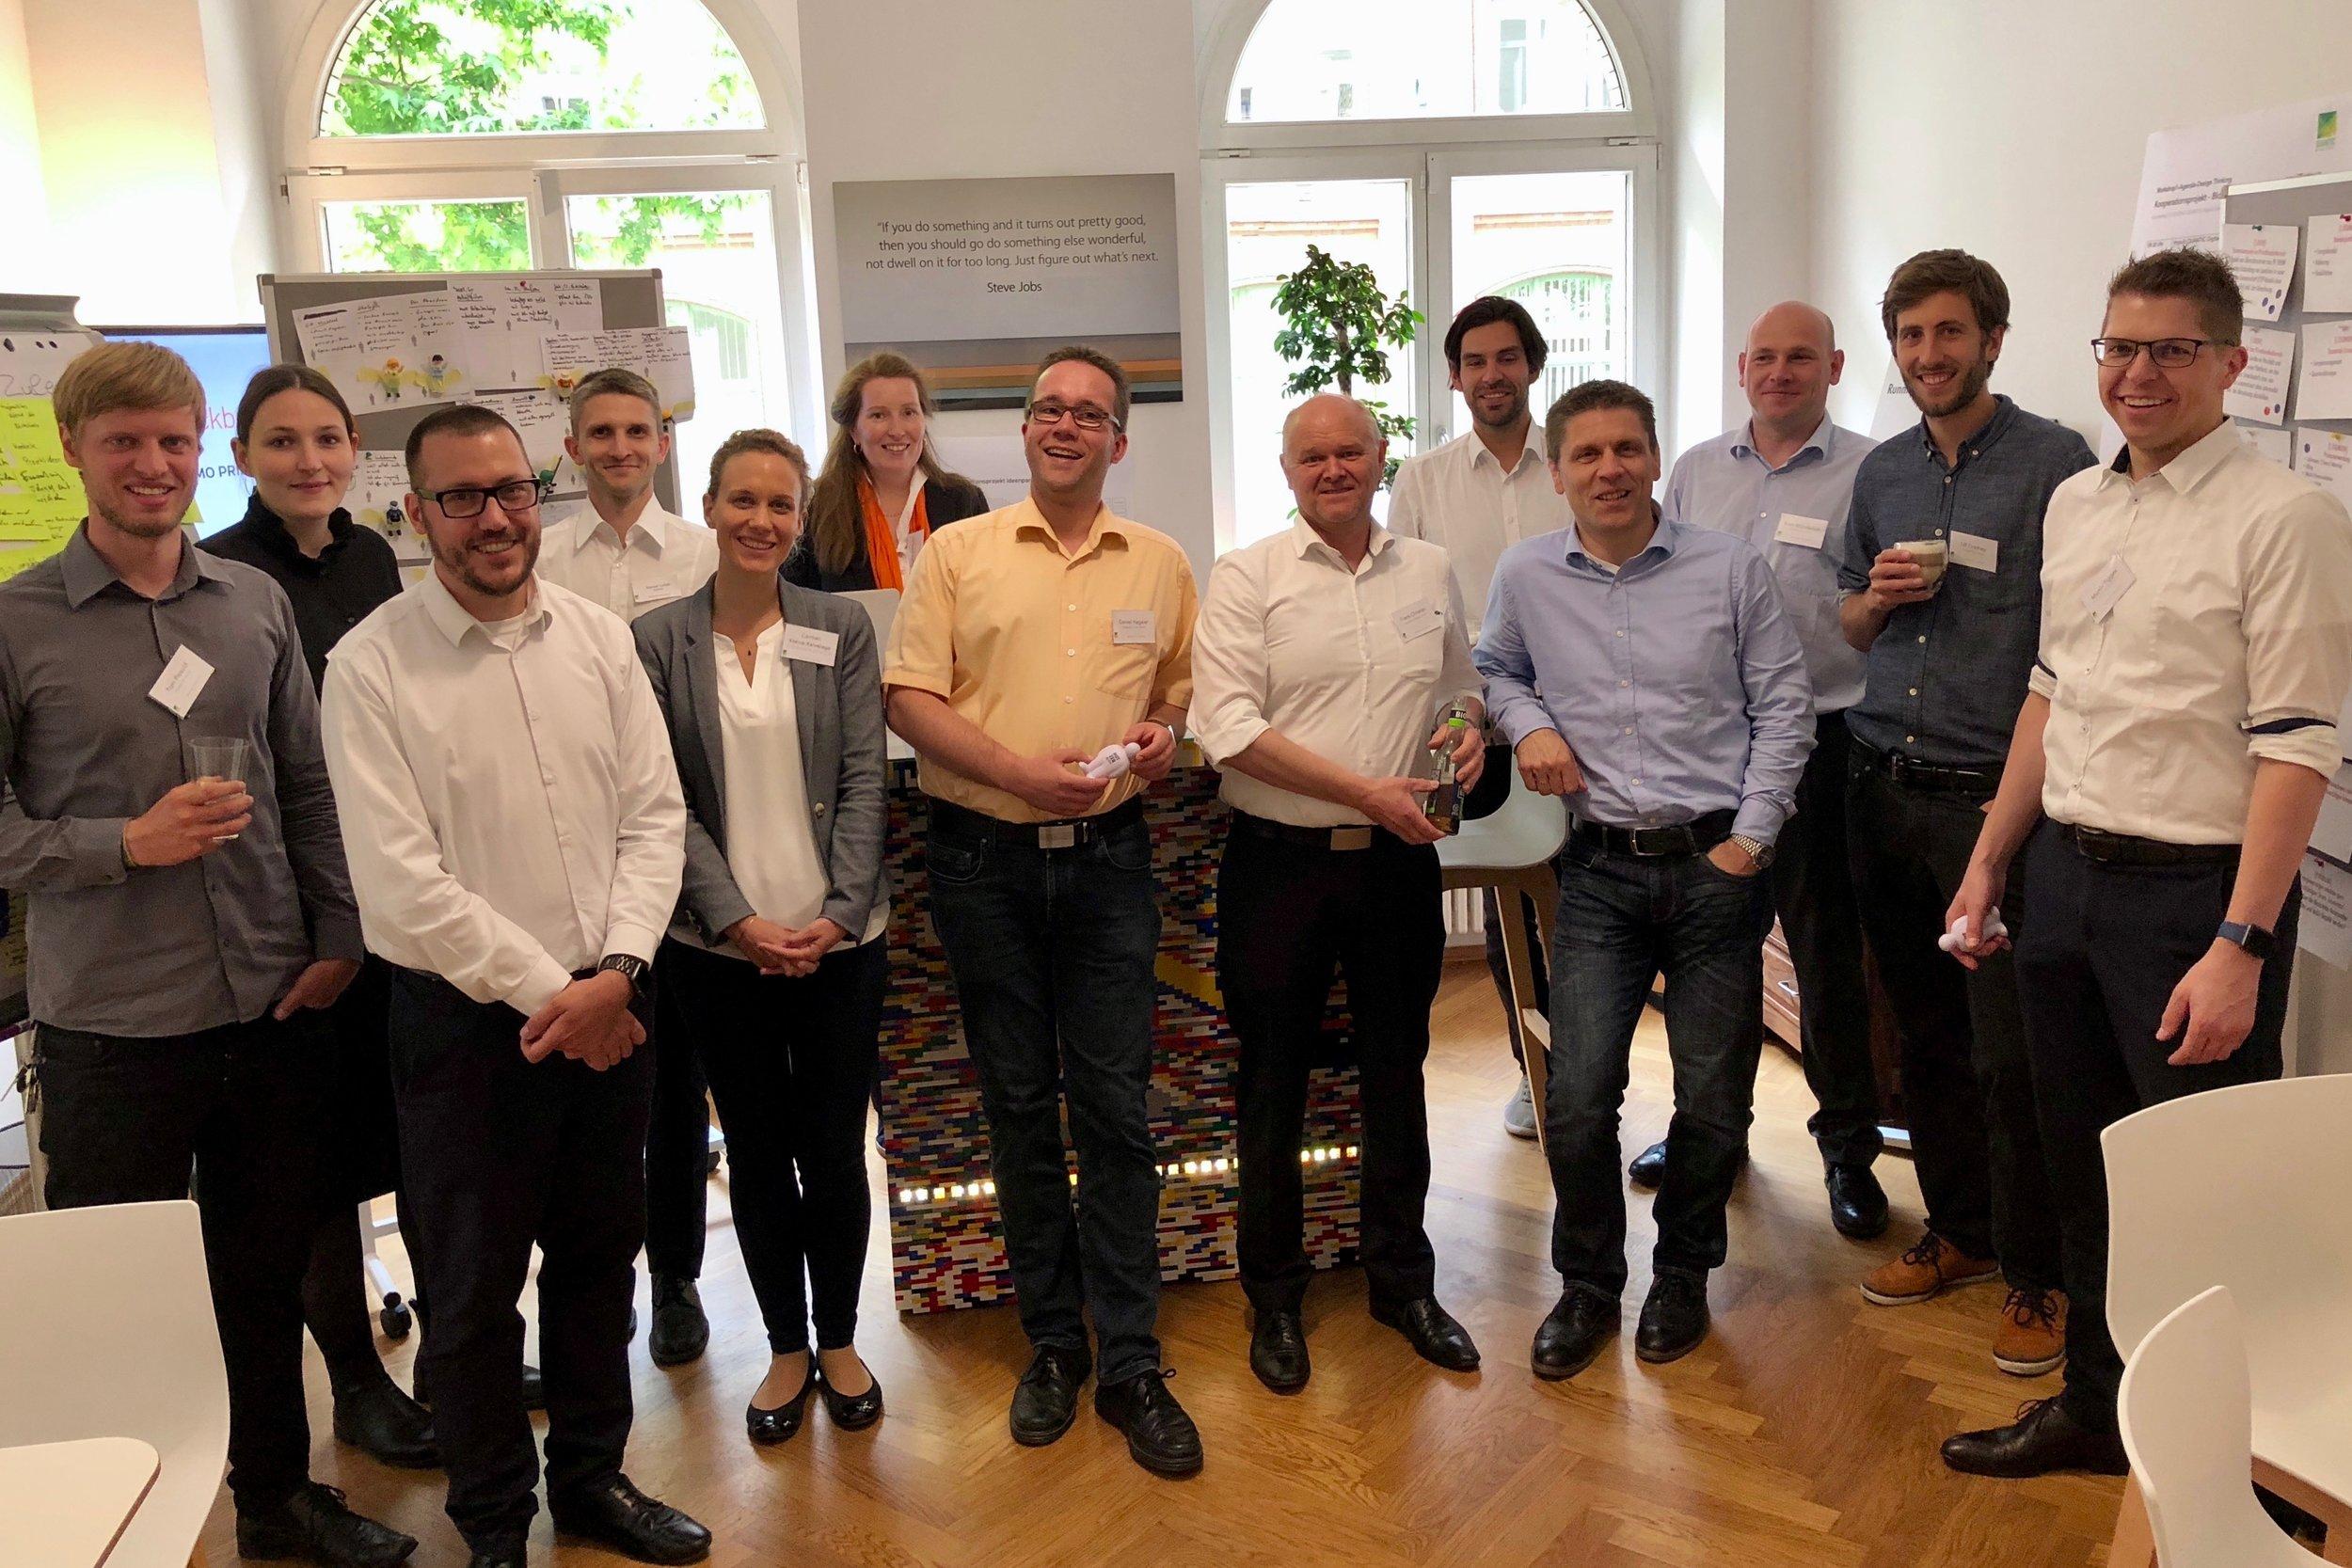 Teilnehmer des Kooperationsprojektes